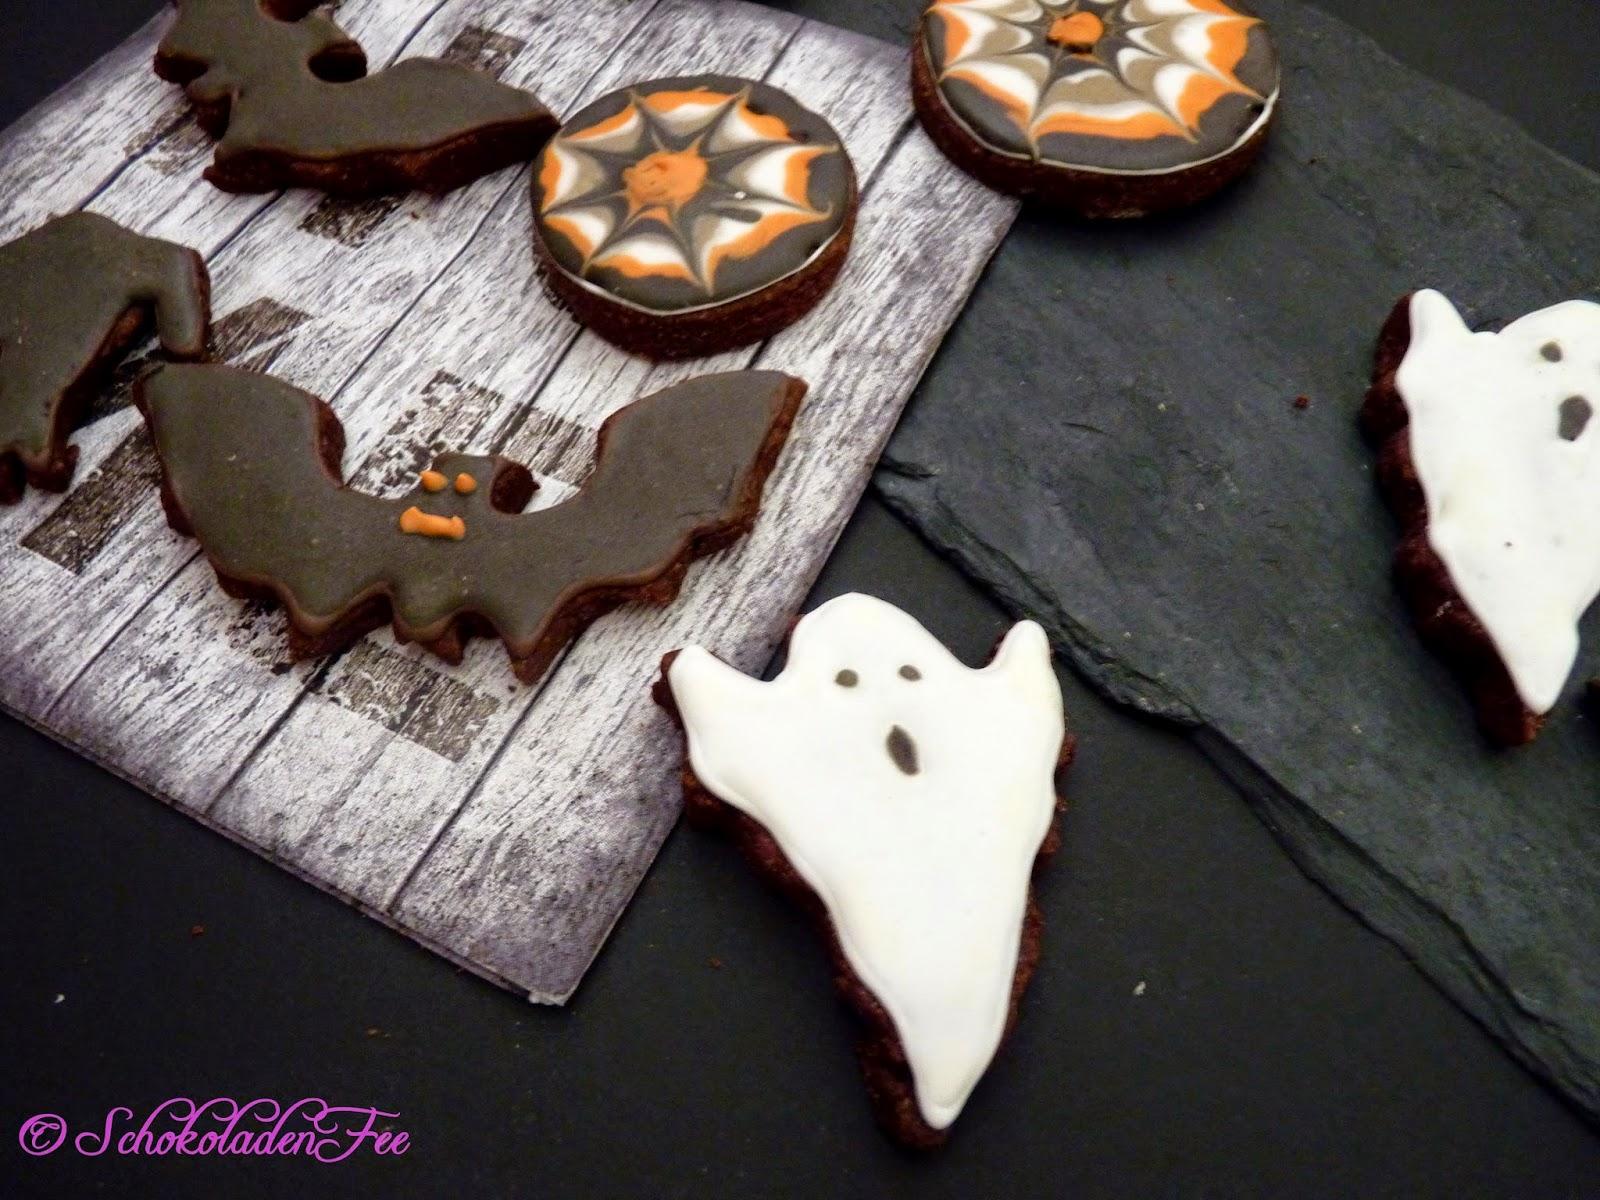 http://schokoladen-fee.blogspot.de/2014/10/zauberhafte-halloween-kekse.html